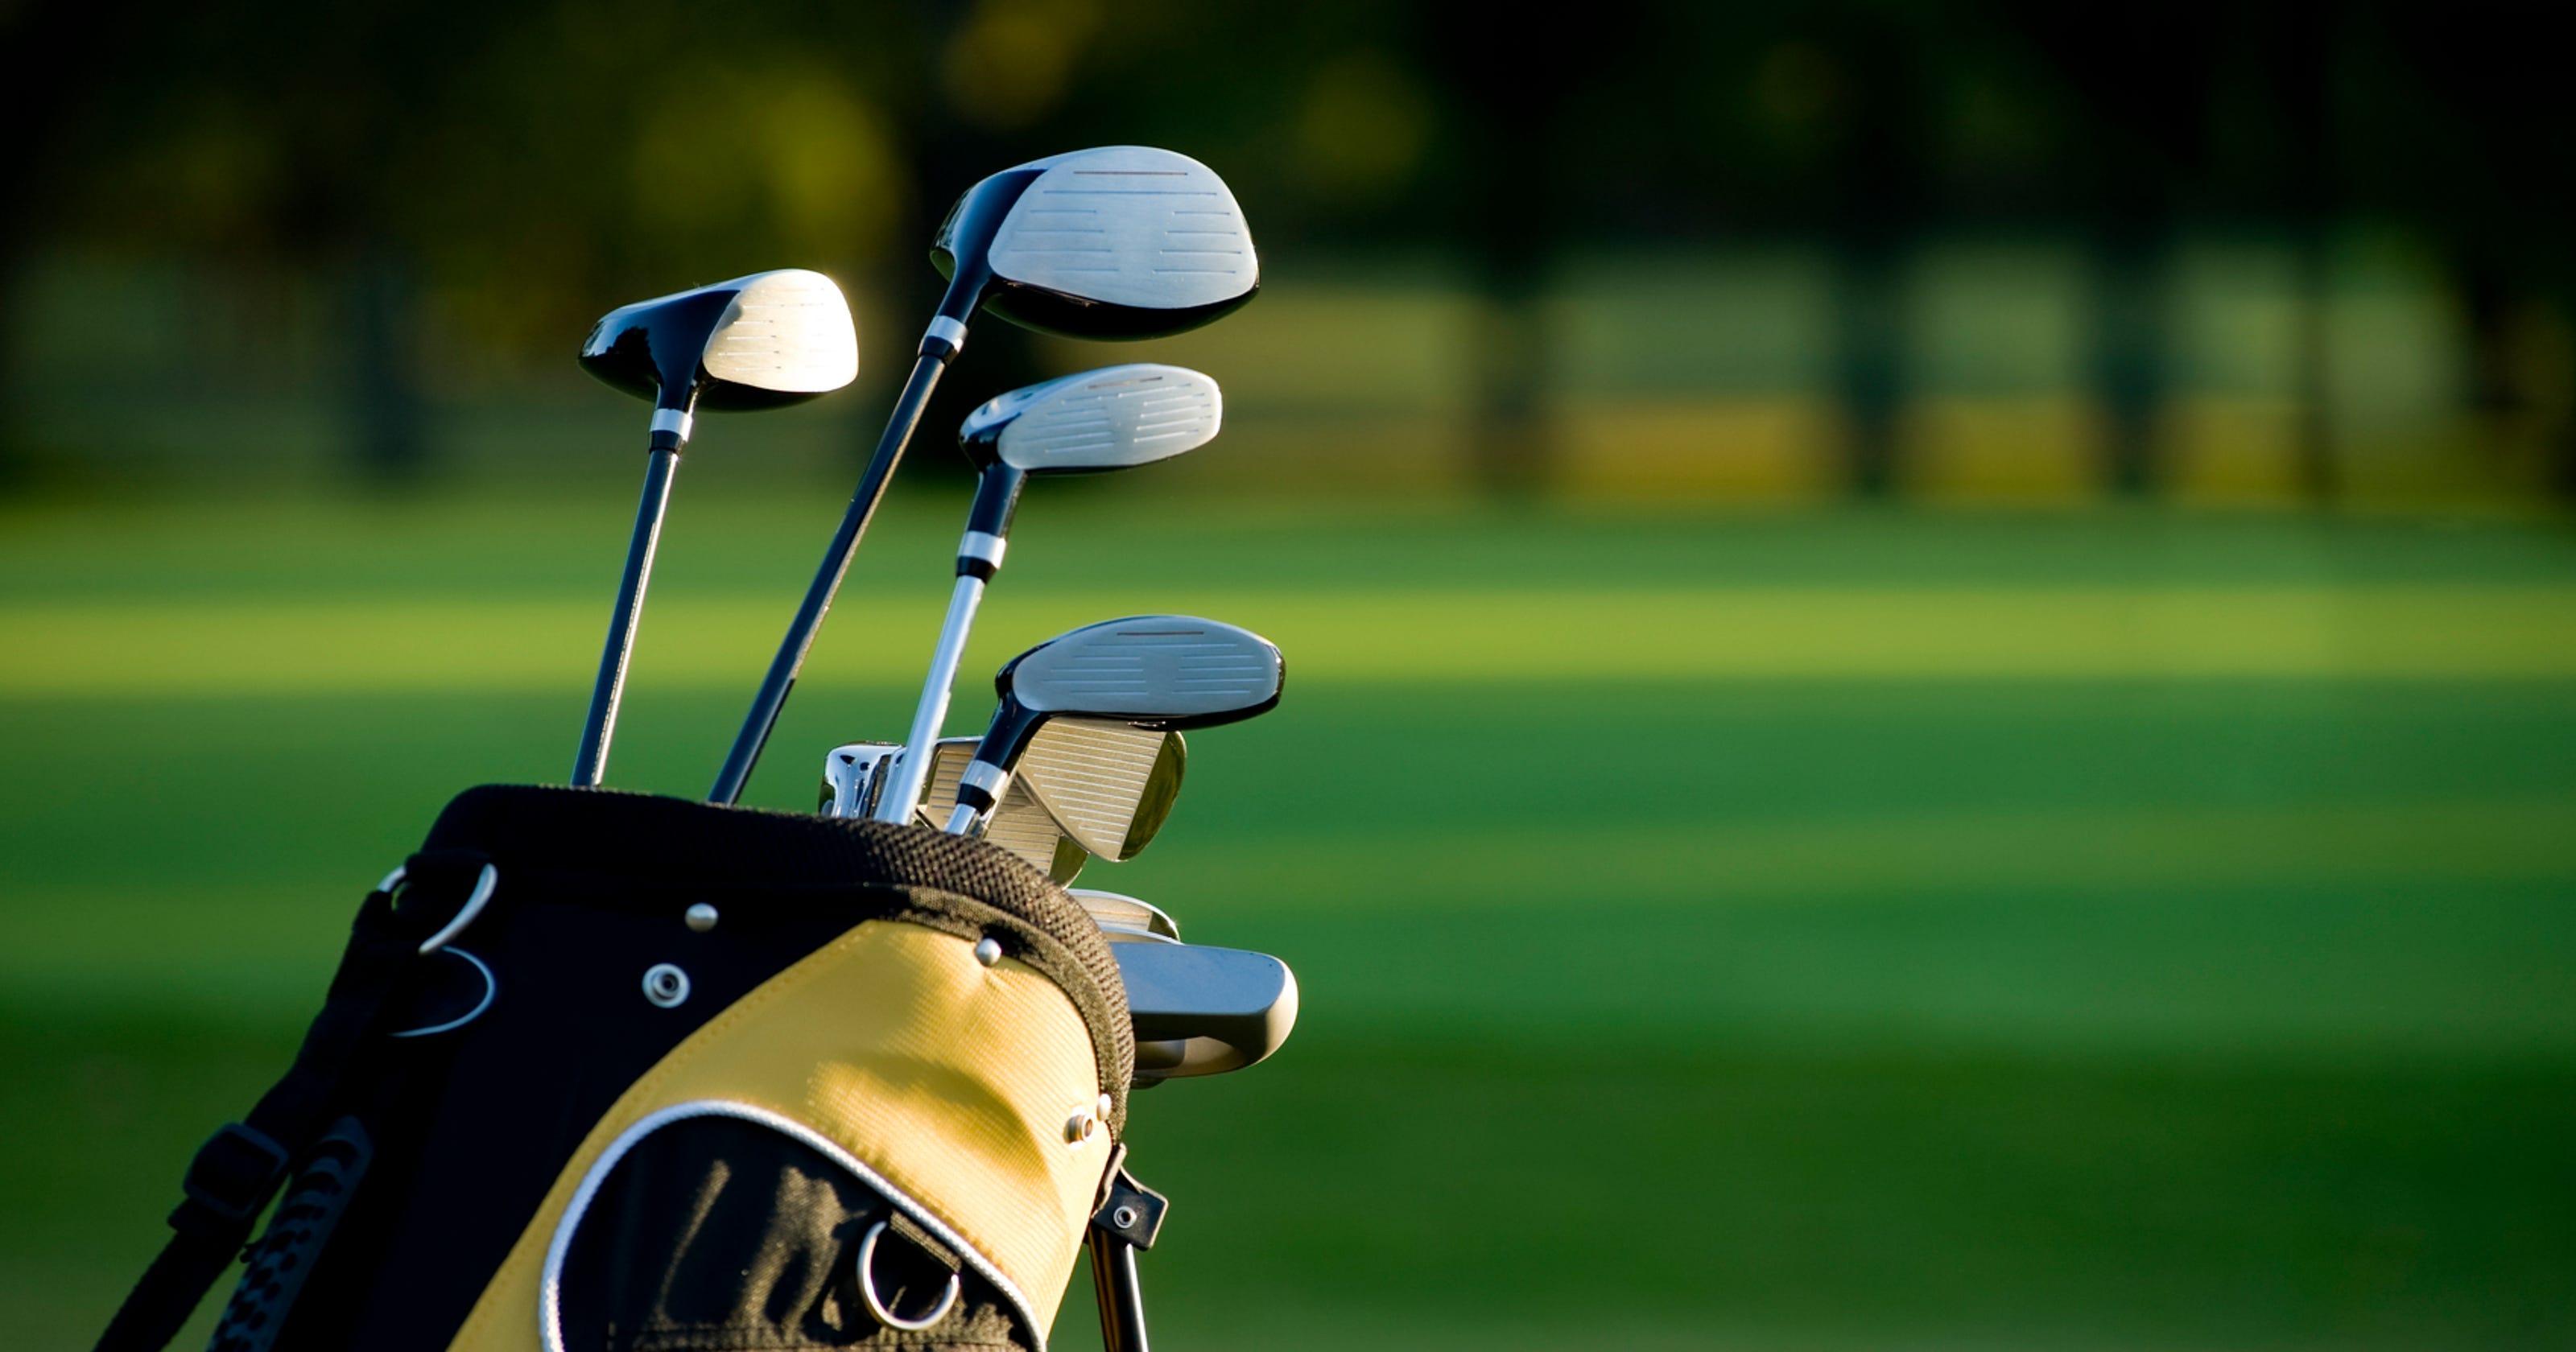 Naples Golf Column Local Qualify For Usga Events